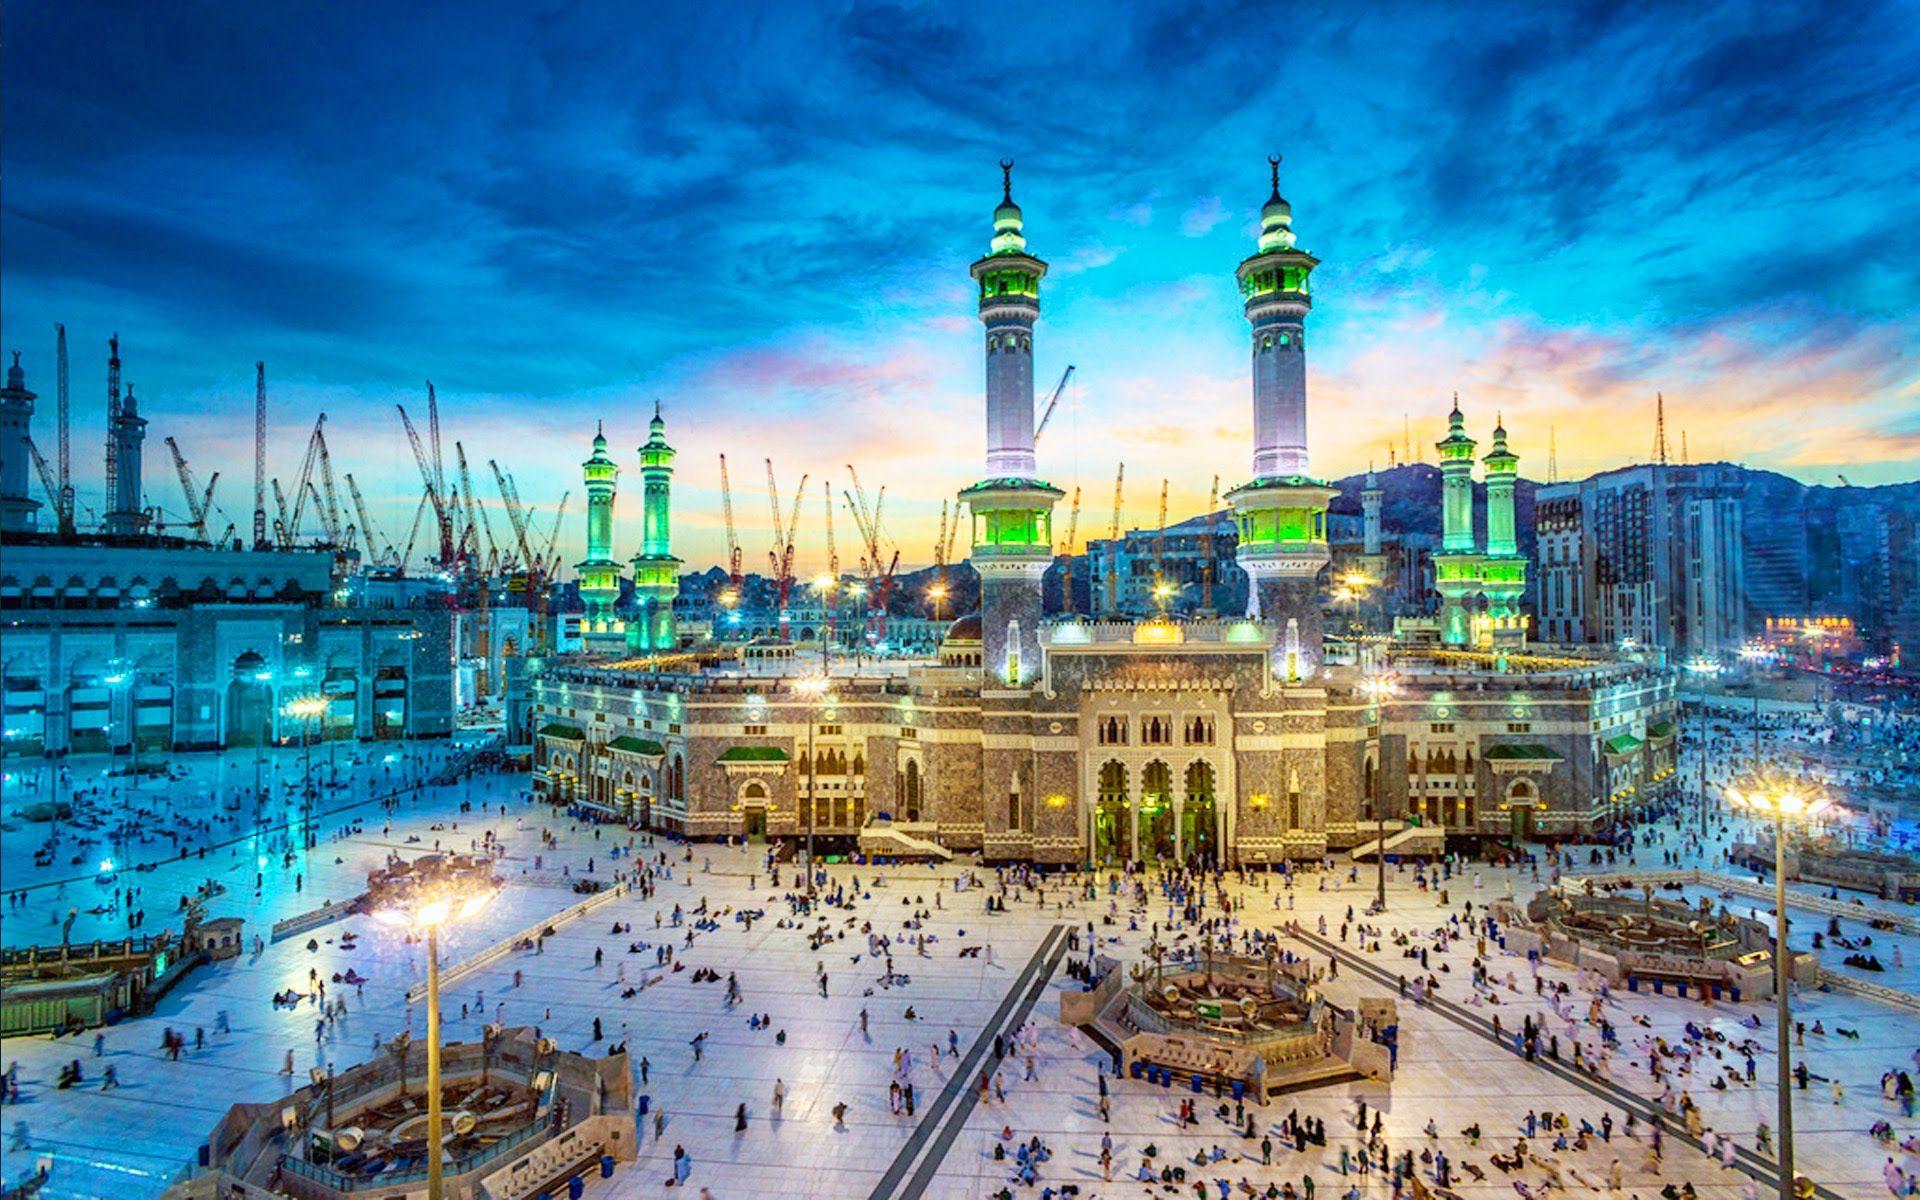 Kaba In Al Masjid Al Haram Al Kaaba Al Musharrafah Great Mosque In